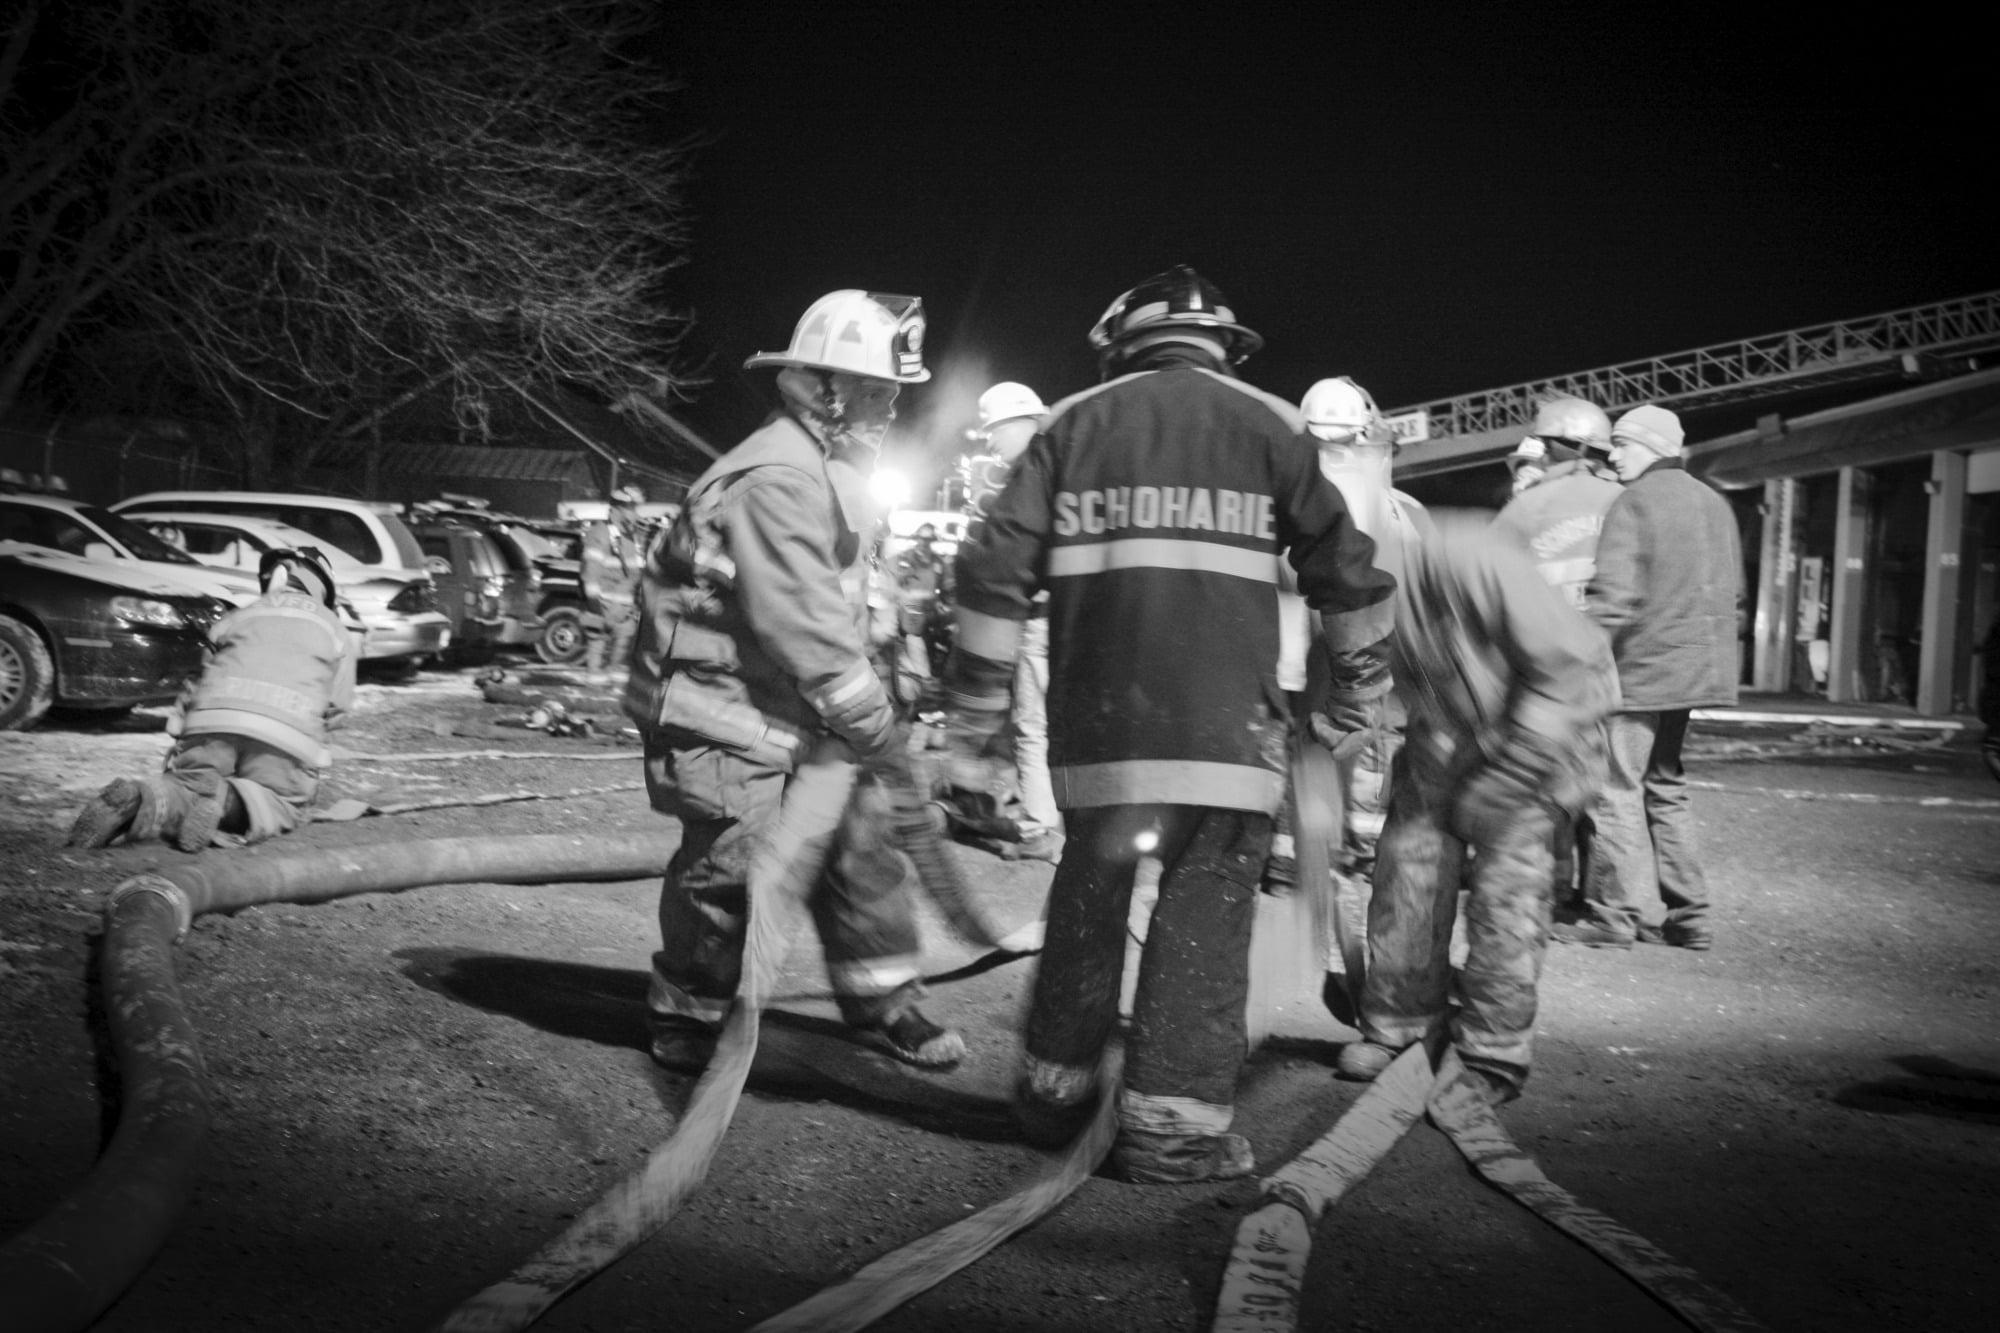 Schoharie County DPW Fire